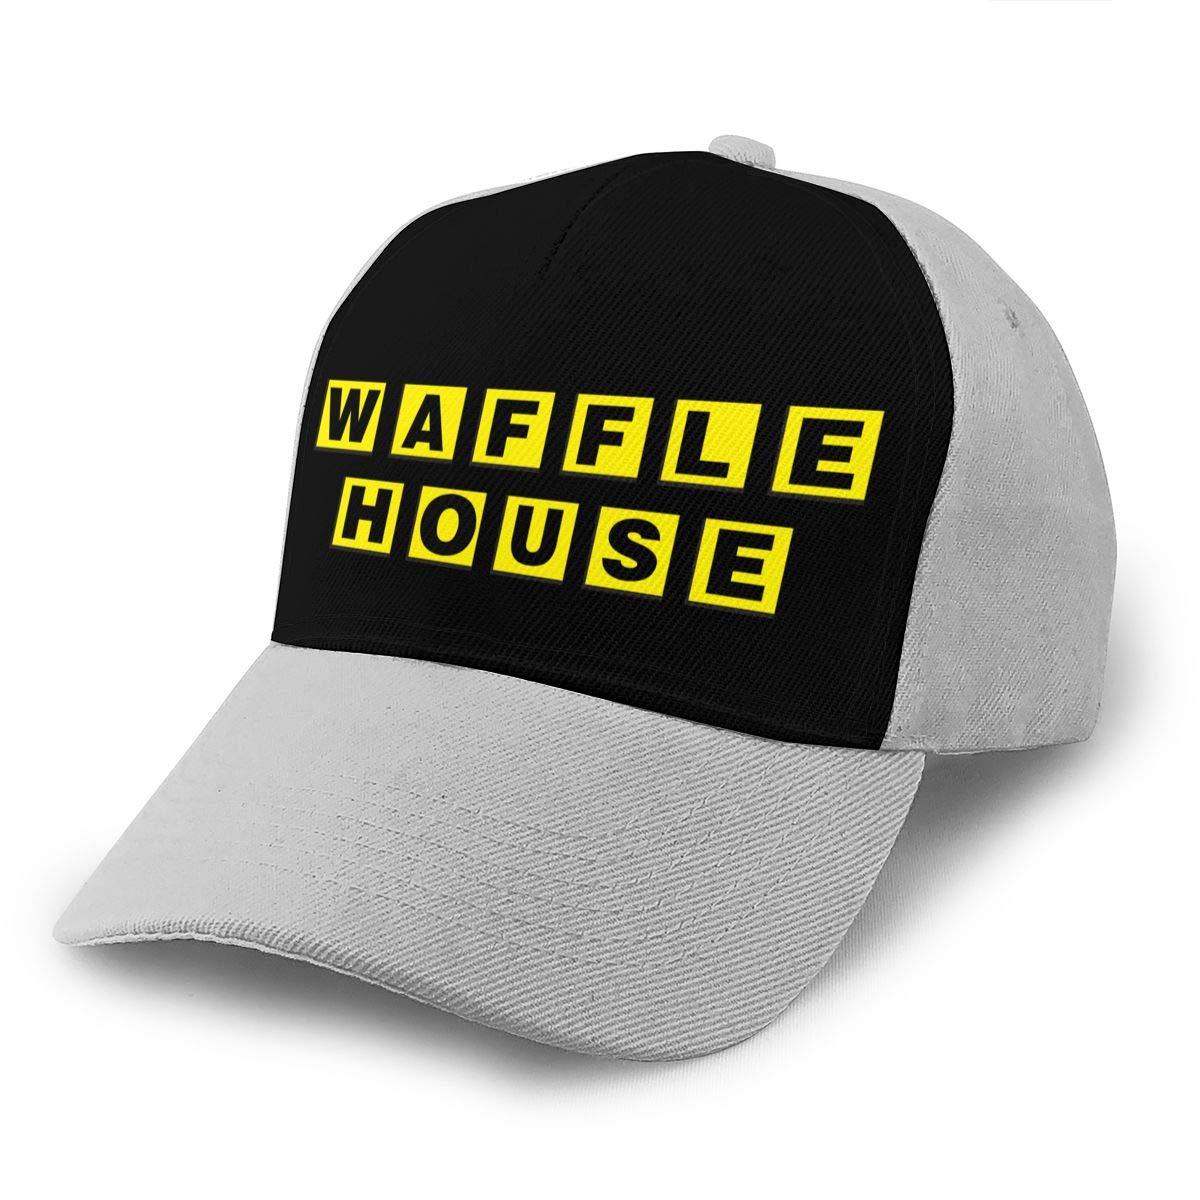 Adjustable Women Men Waffle-House-Logo Print Baseball Cap Flat Brim Cap Hats Hip Hop Snapback Sun Hat Boys Girls Gray by Apolonia